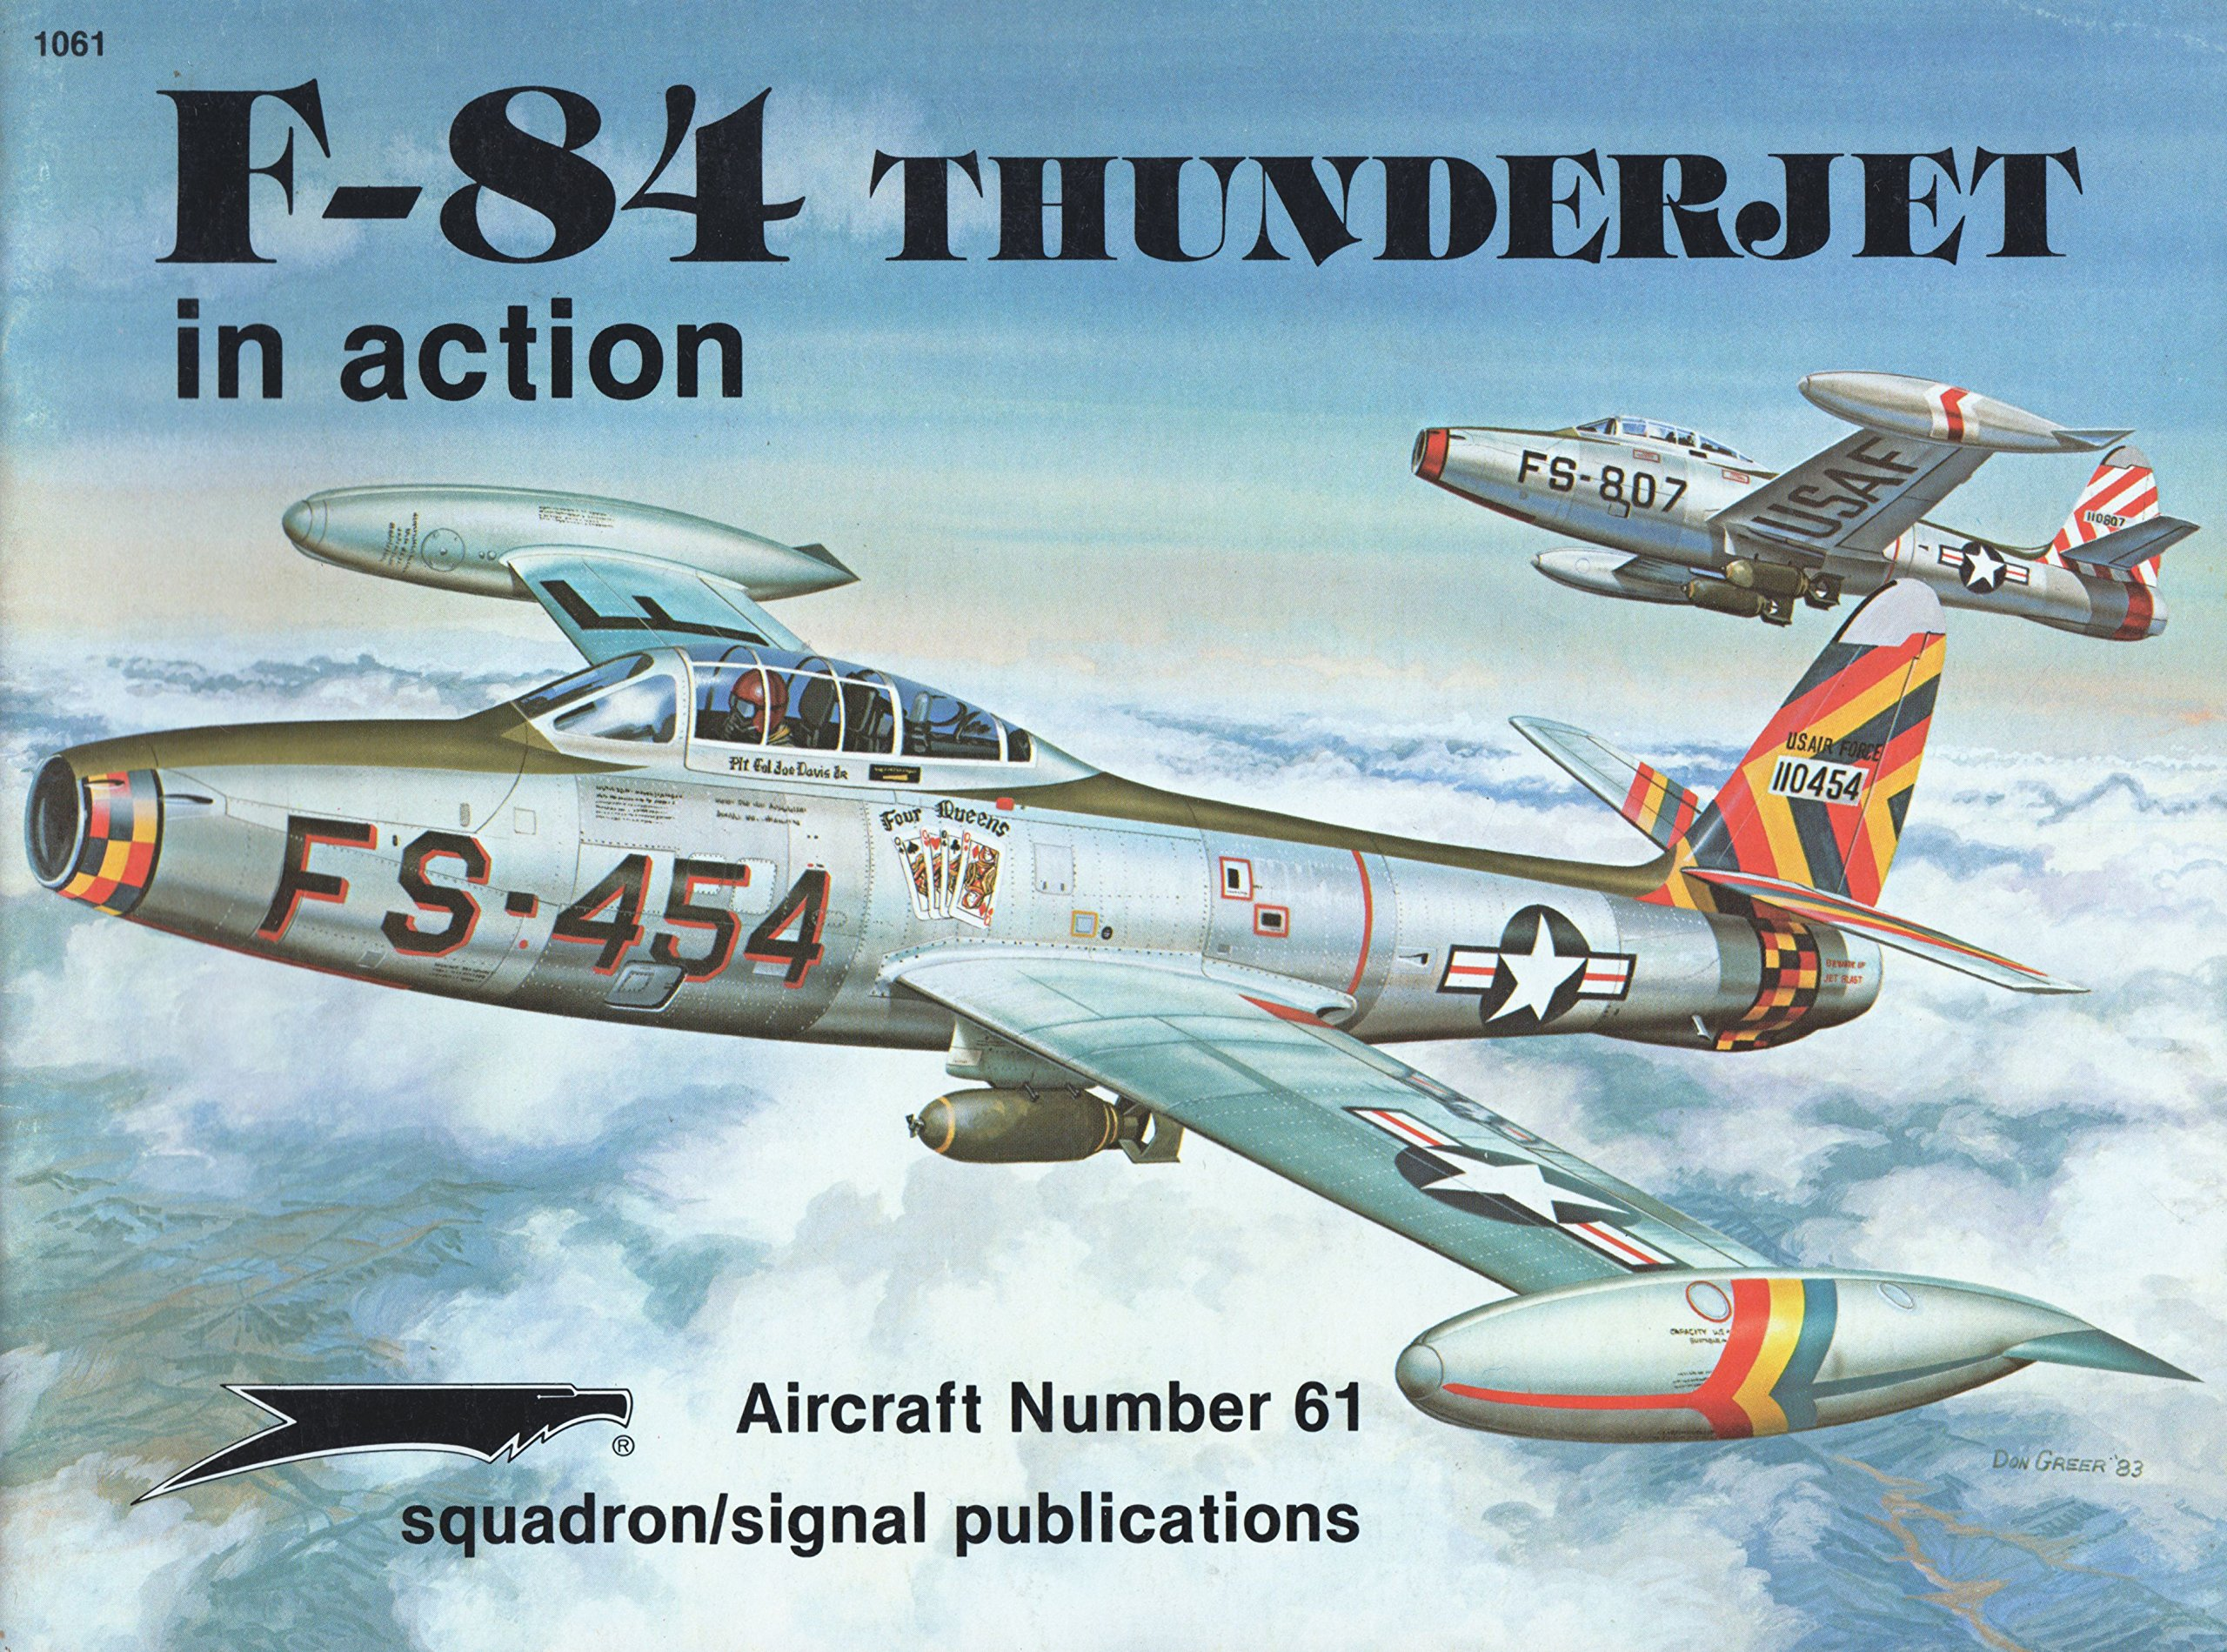 Image result for f84 thunderjet in action